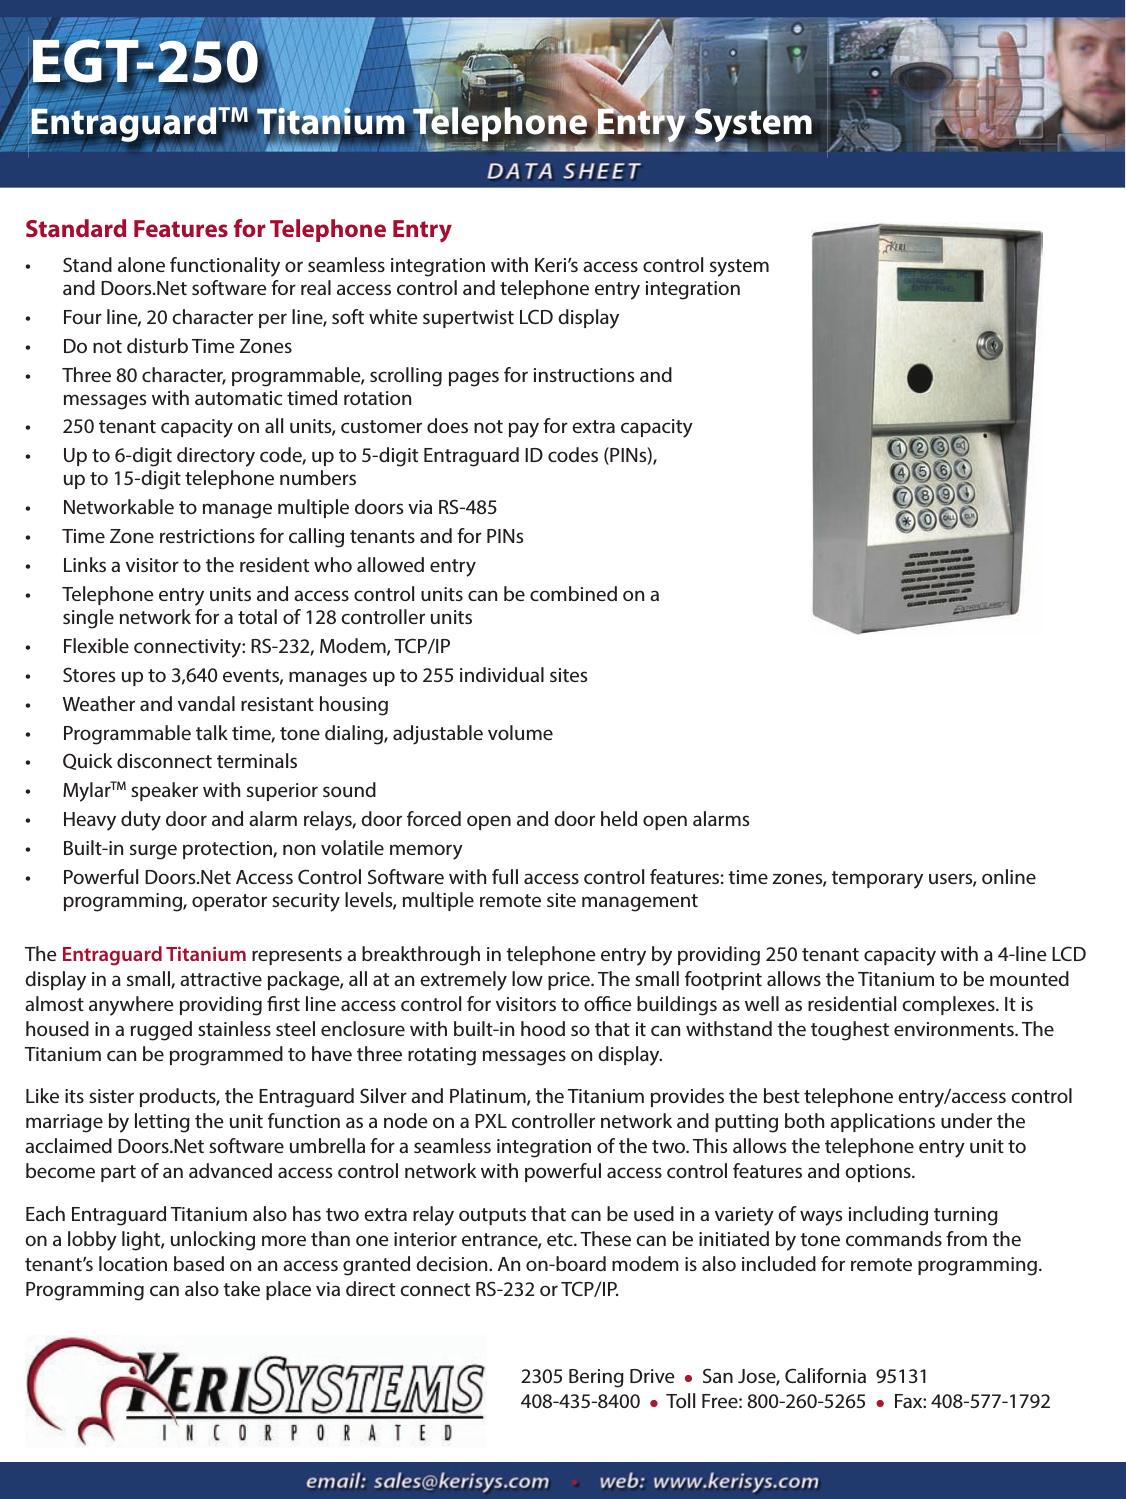 Keri Systems EGT 250 DS W Part#u0027s Entraguard Titanium Telephone Entry System EGT250Data Sheet2015  sc 1 st  UserManual.wiki & Keri Systems EGT 250 DS W Part#u0027s Entraguard Titanium Telephone ...